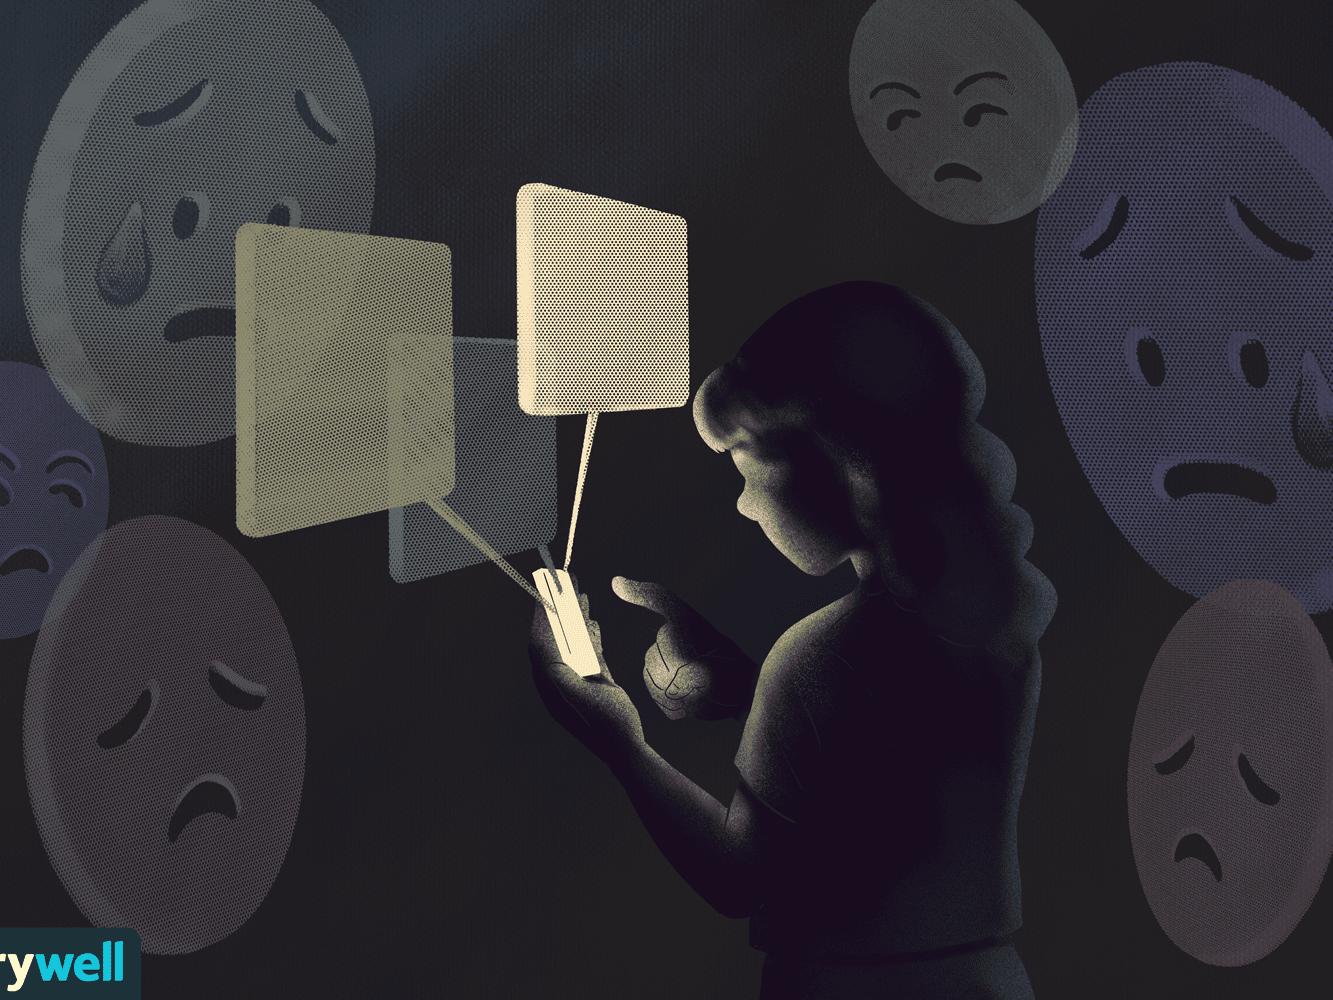 5 Ways Social Media Affects Teen Mental Health